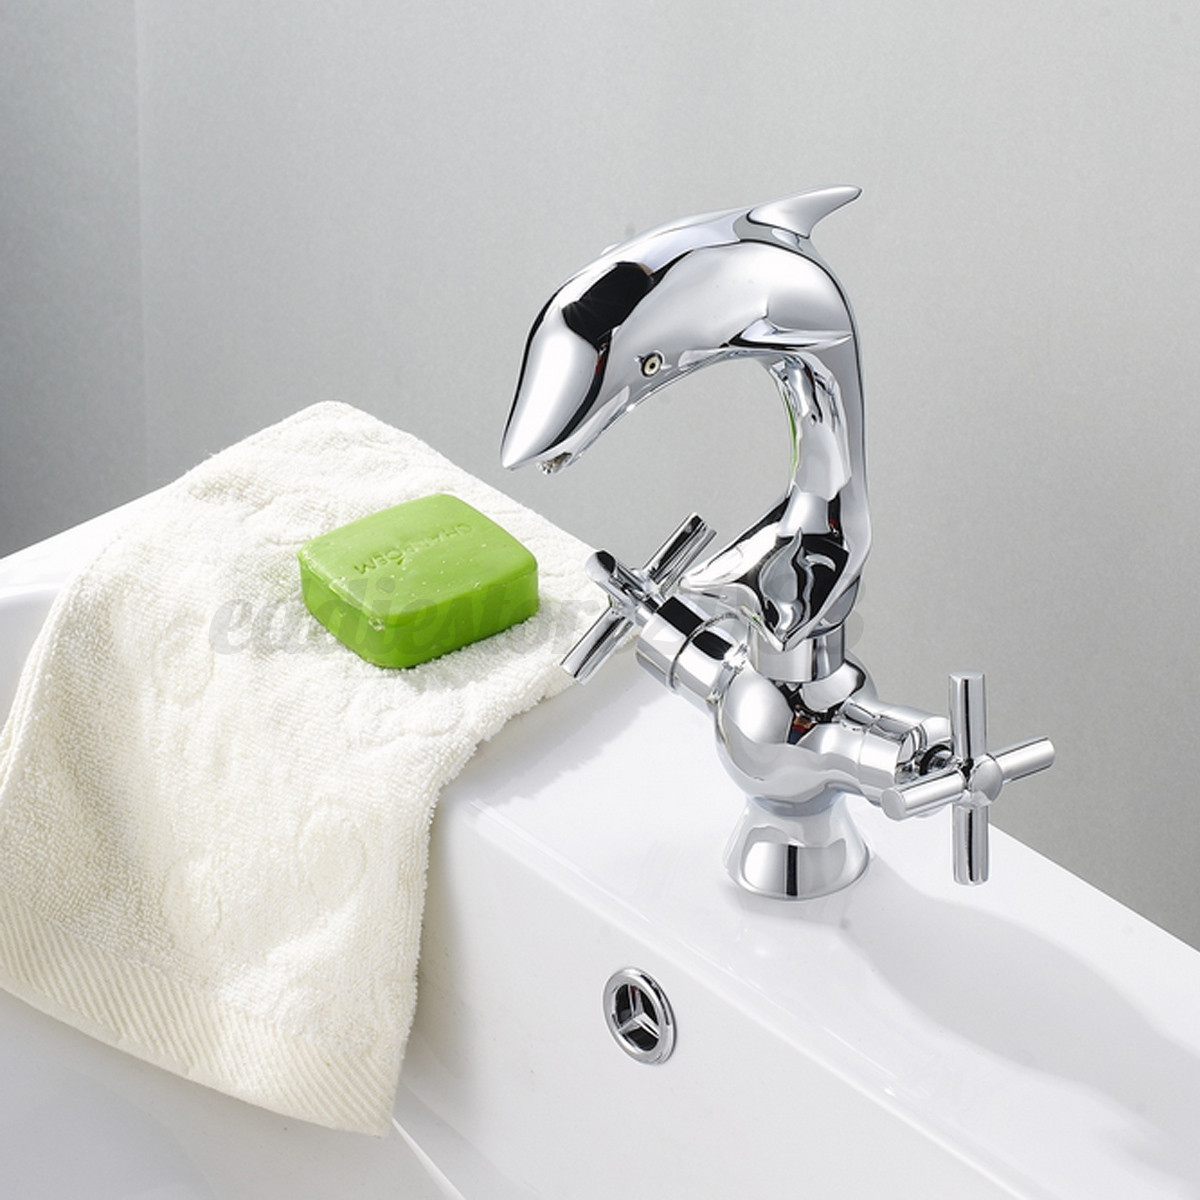 Dolphin Shape Double Handle Basin Sink Mixer Tap Bathroom